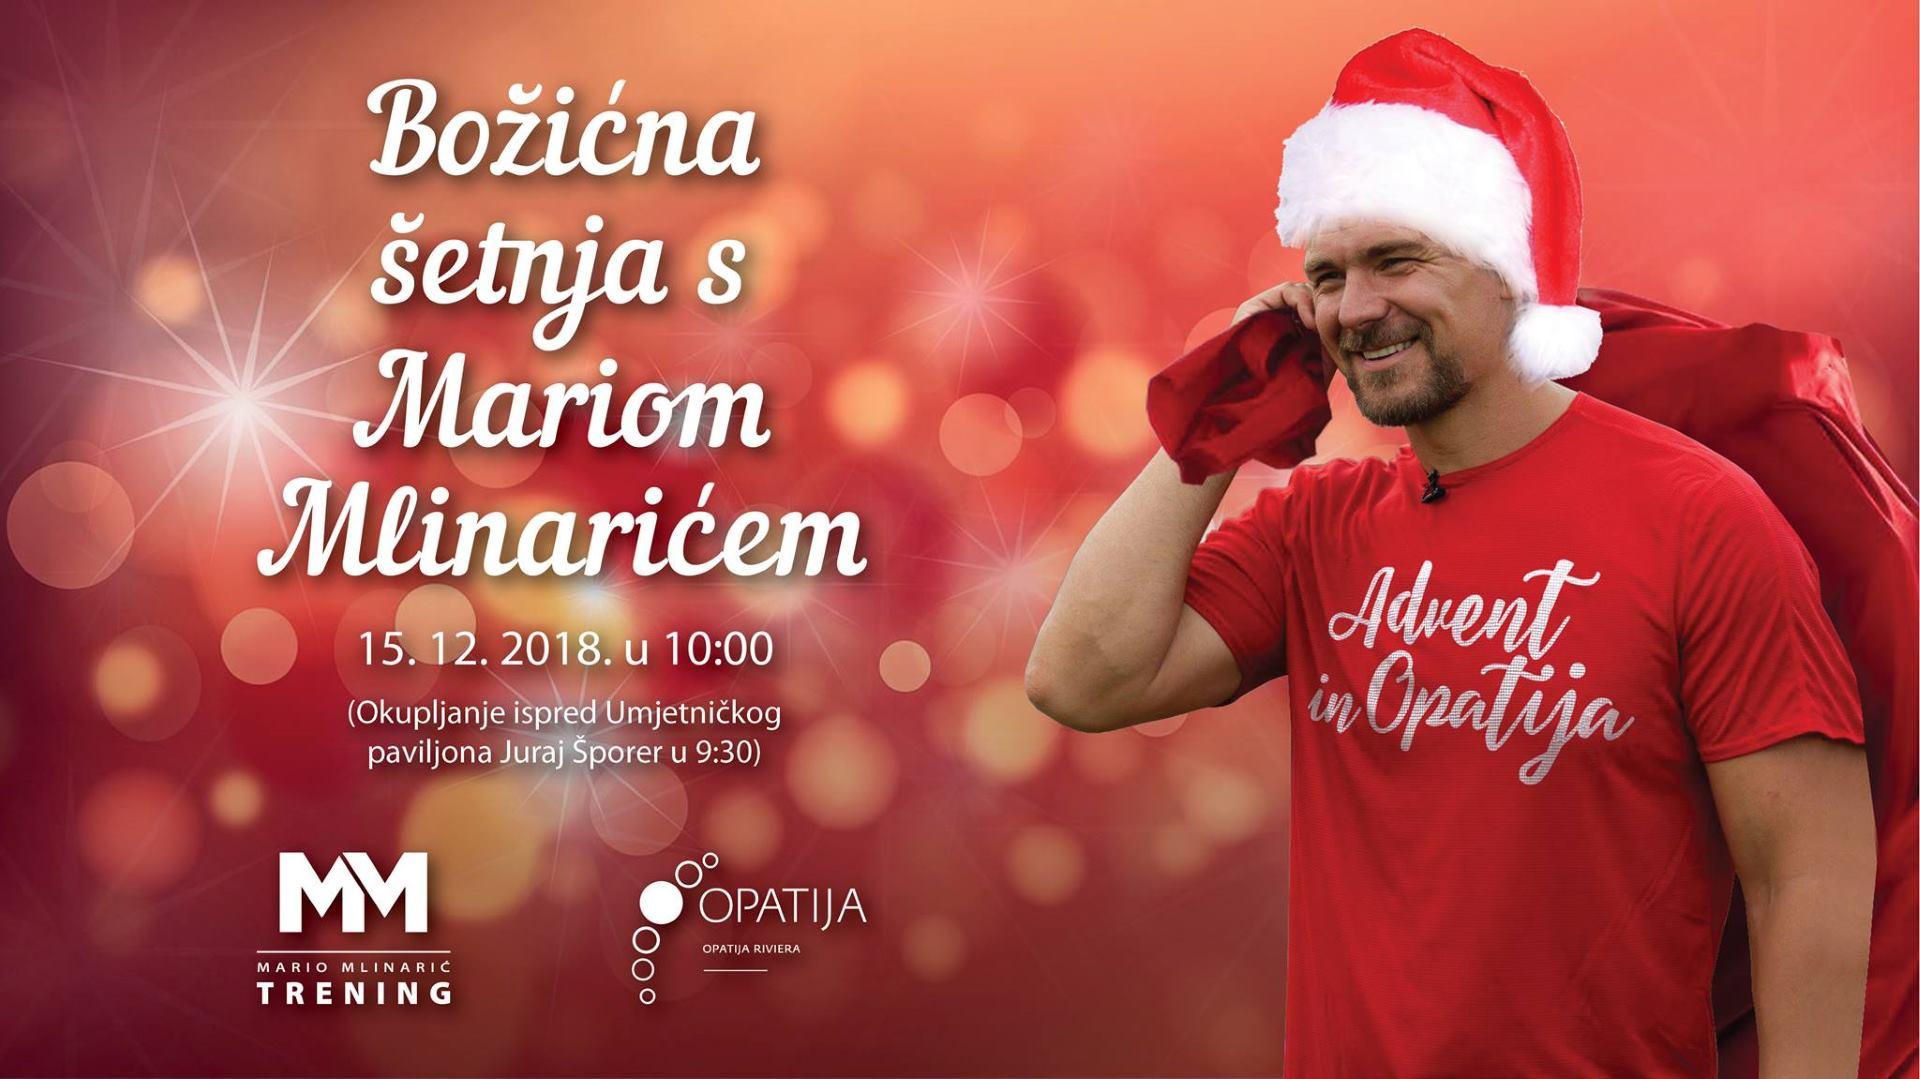 ADVENT OPATIJA Božićna šetnja s trenerom Mariom Mlinarićem